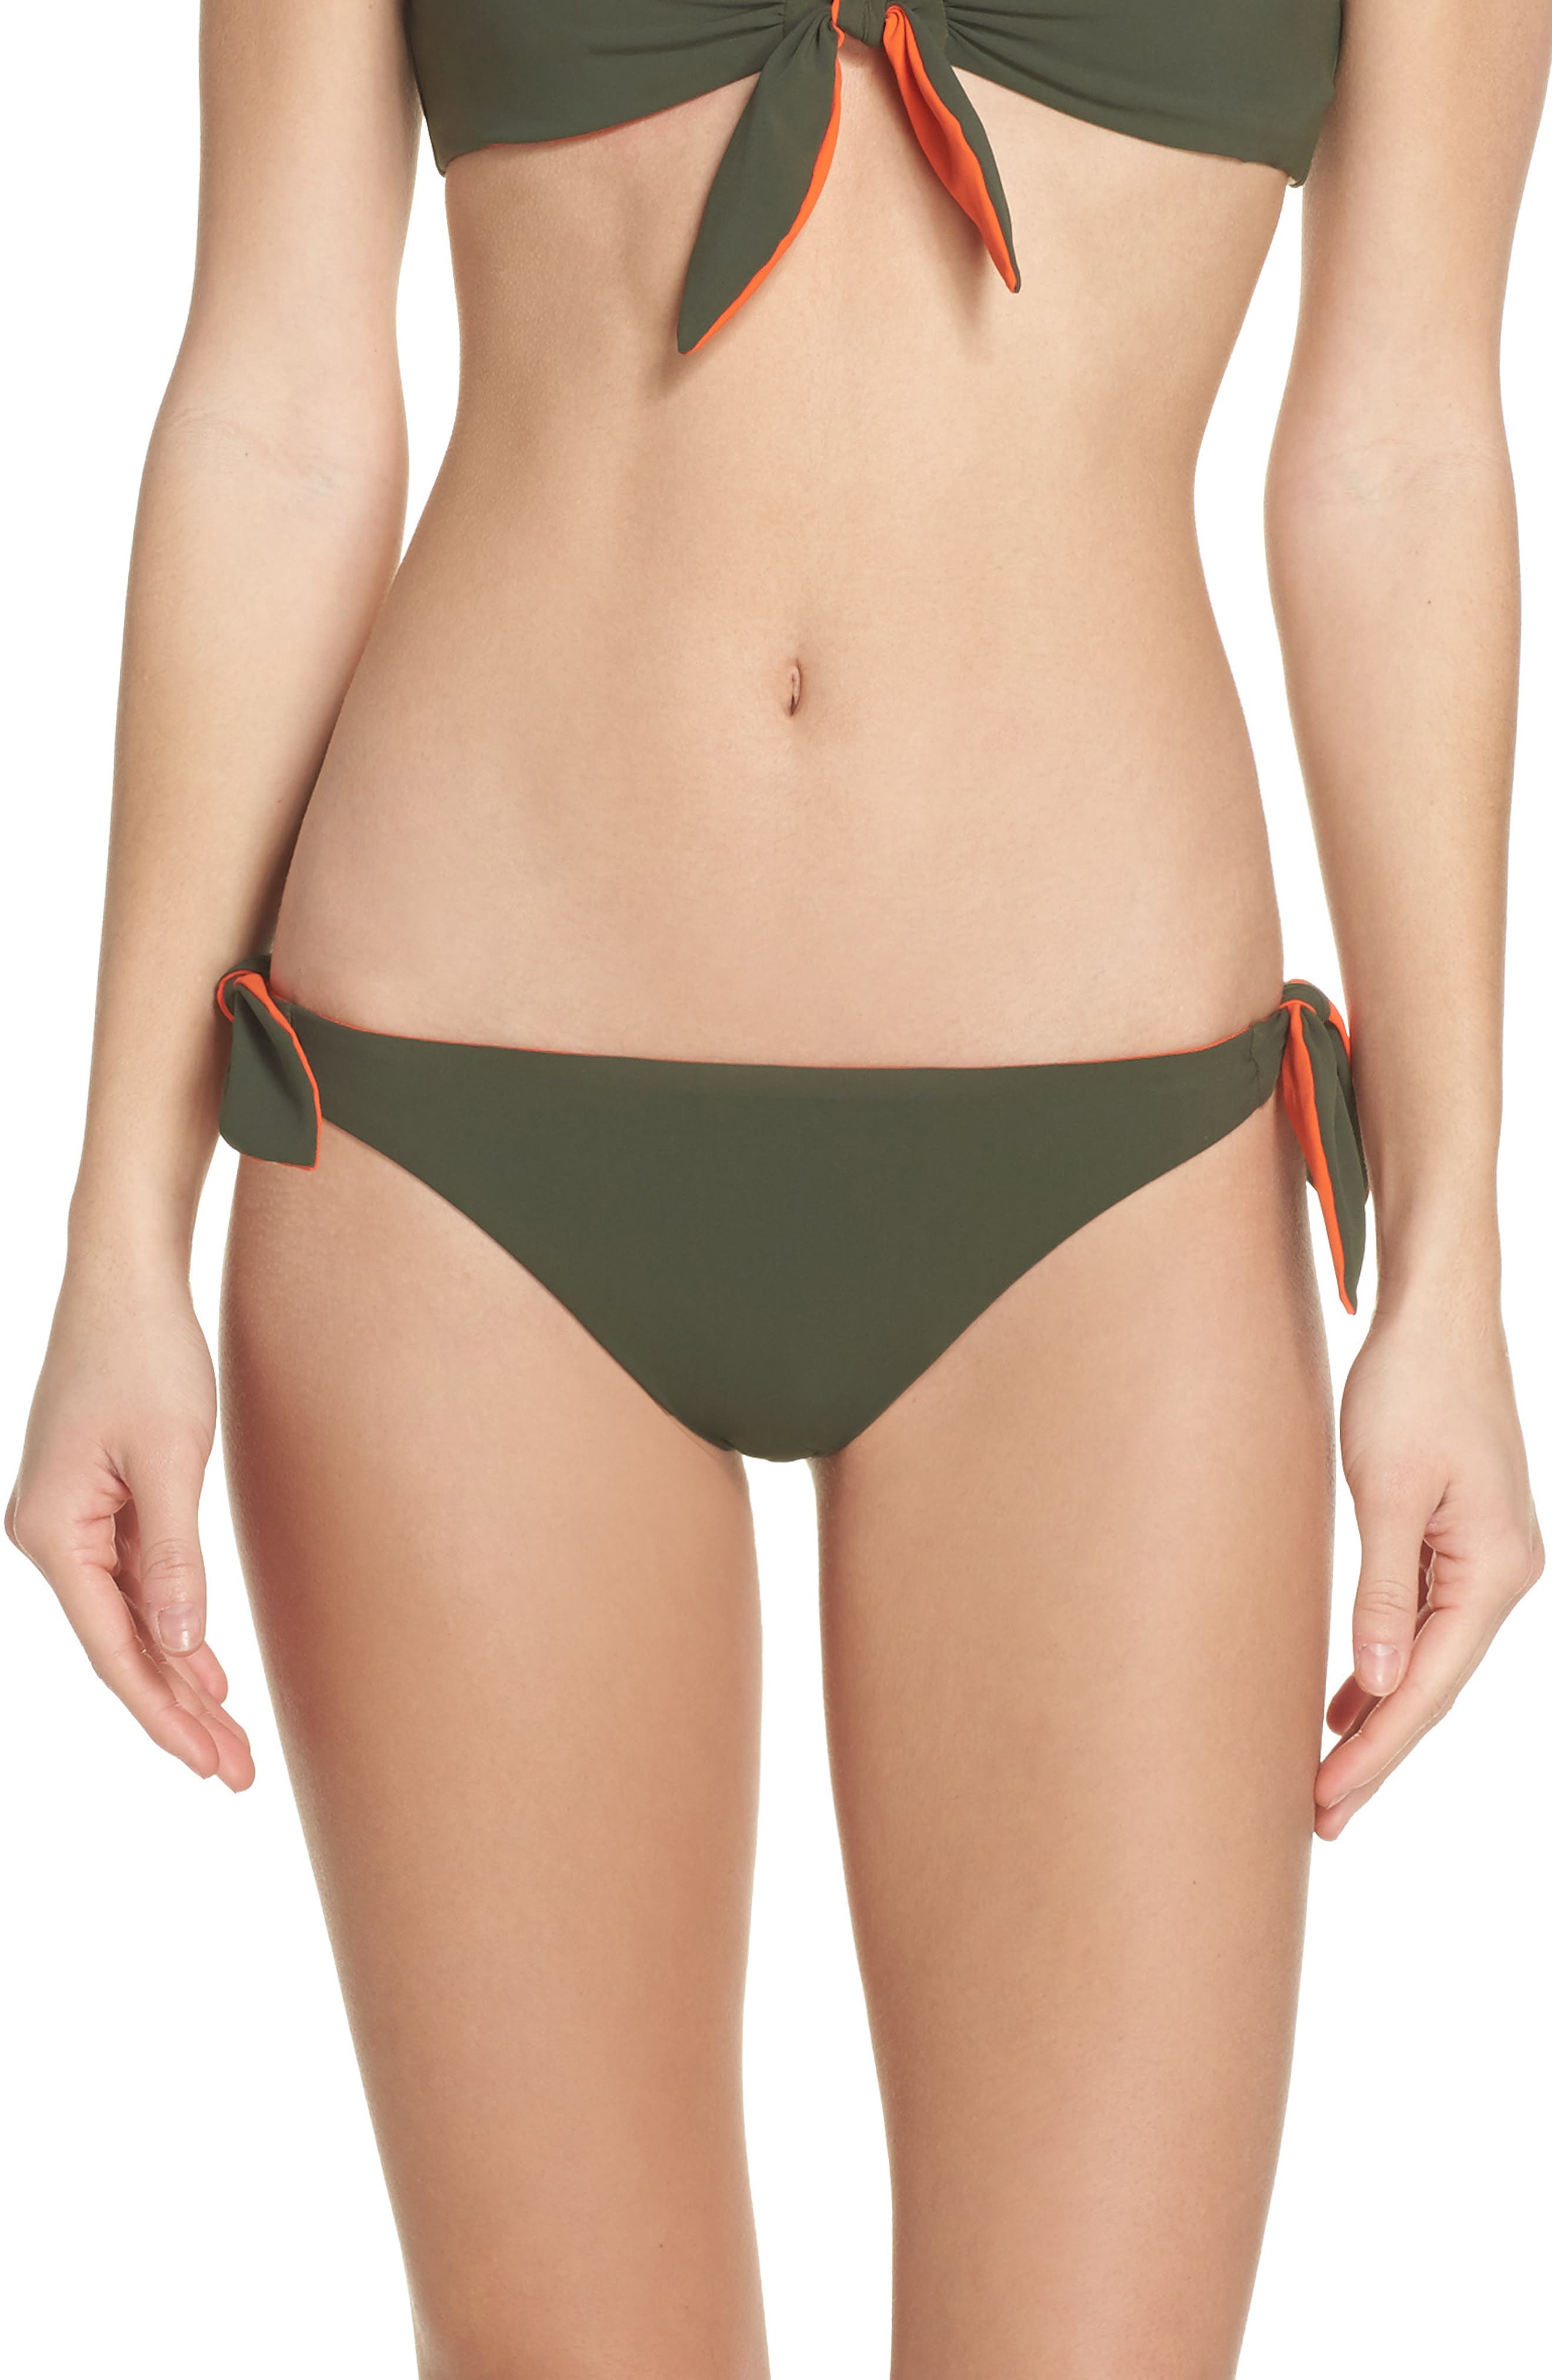 Biarritz Reversible Bikini Bottoms,                             Main thumbnail 1, color,                             Green Olive/ Sweet Tangerine